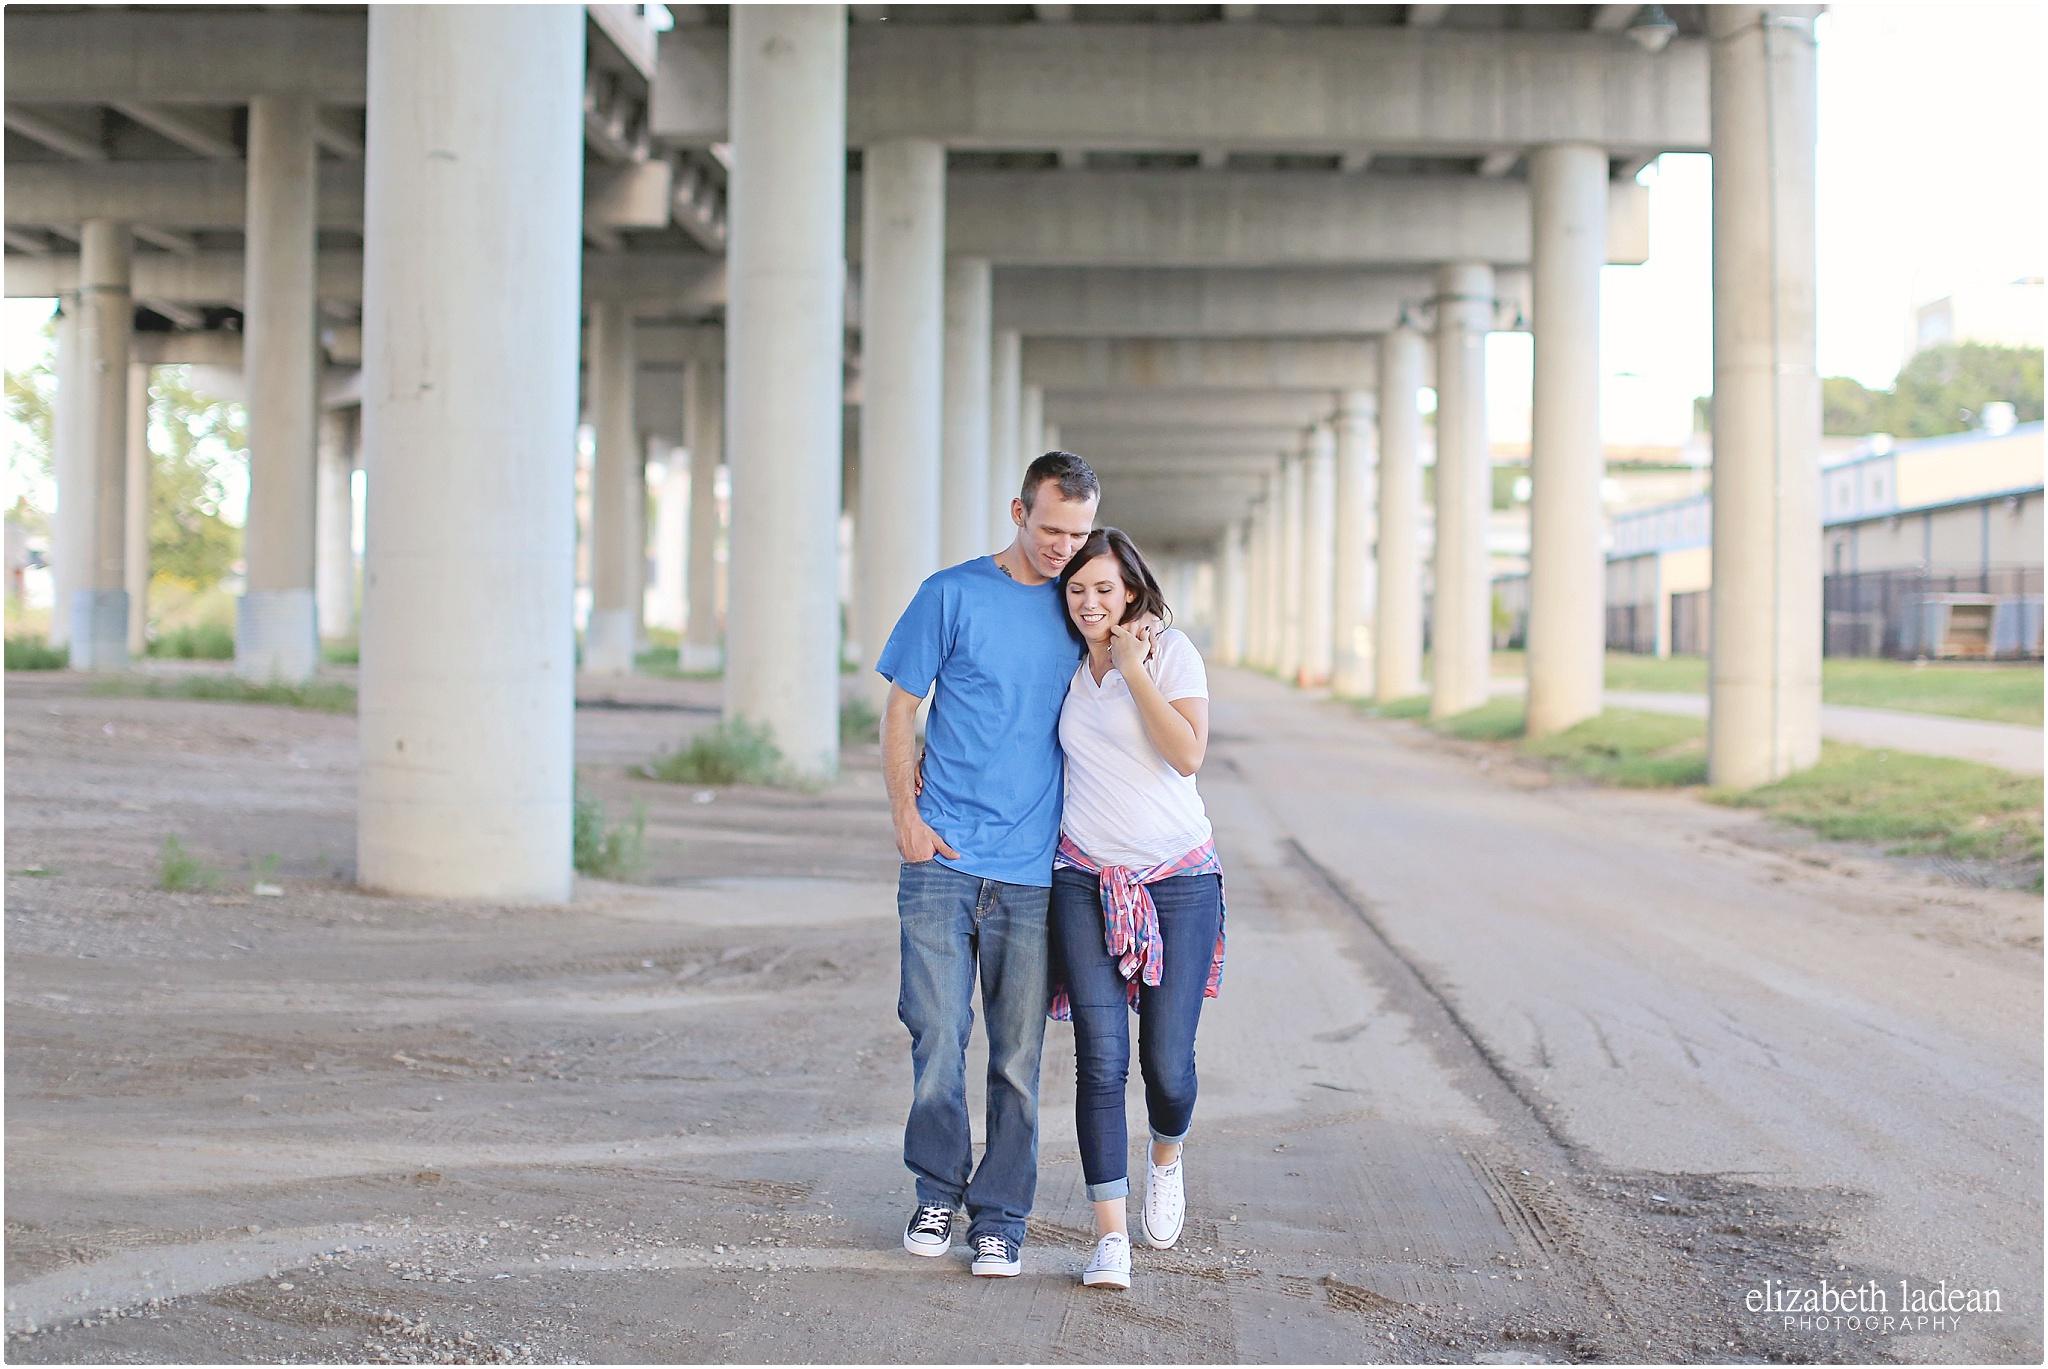 West-Bottoms-Downtown-Kansas-City-Urban-engagement-photos-M+C01-Elizabeth-Ladean-Photography-photo_7271.jpg